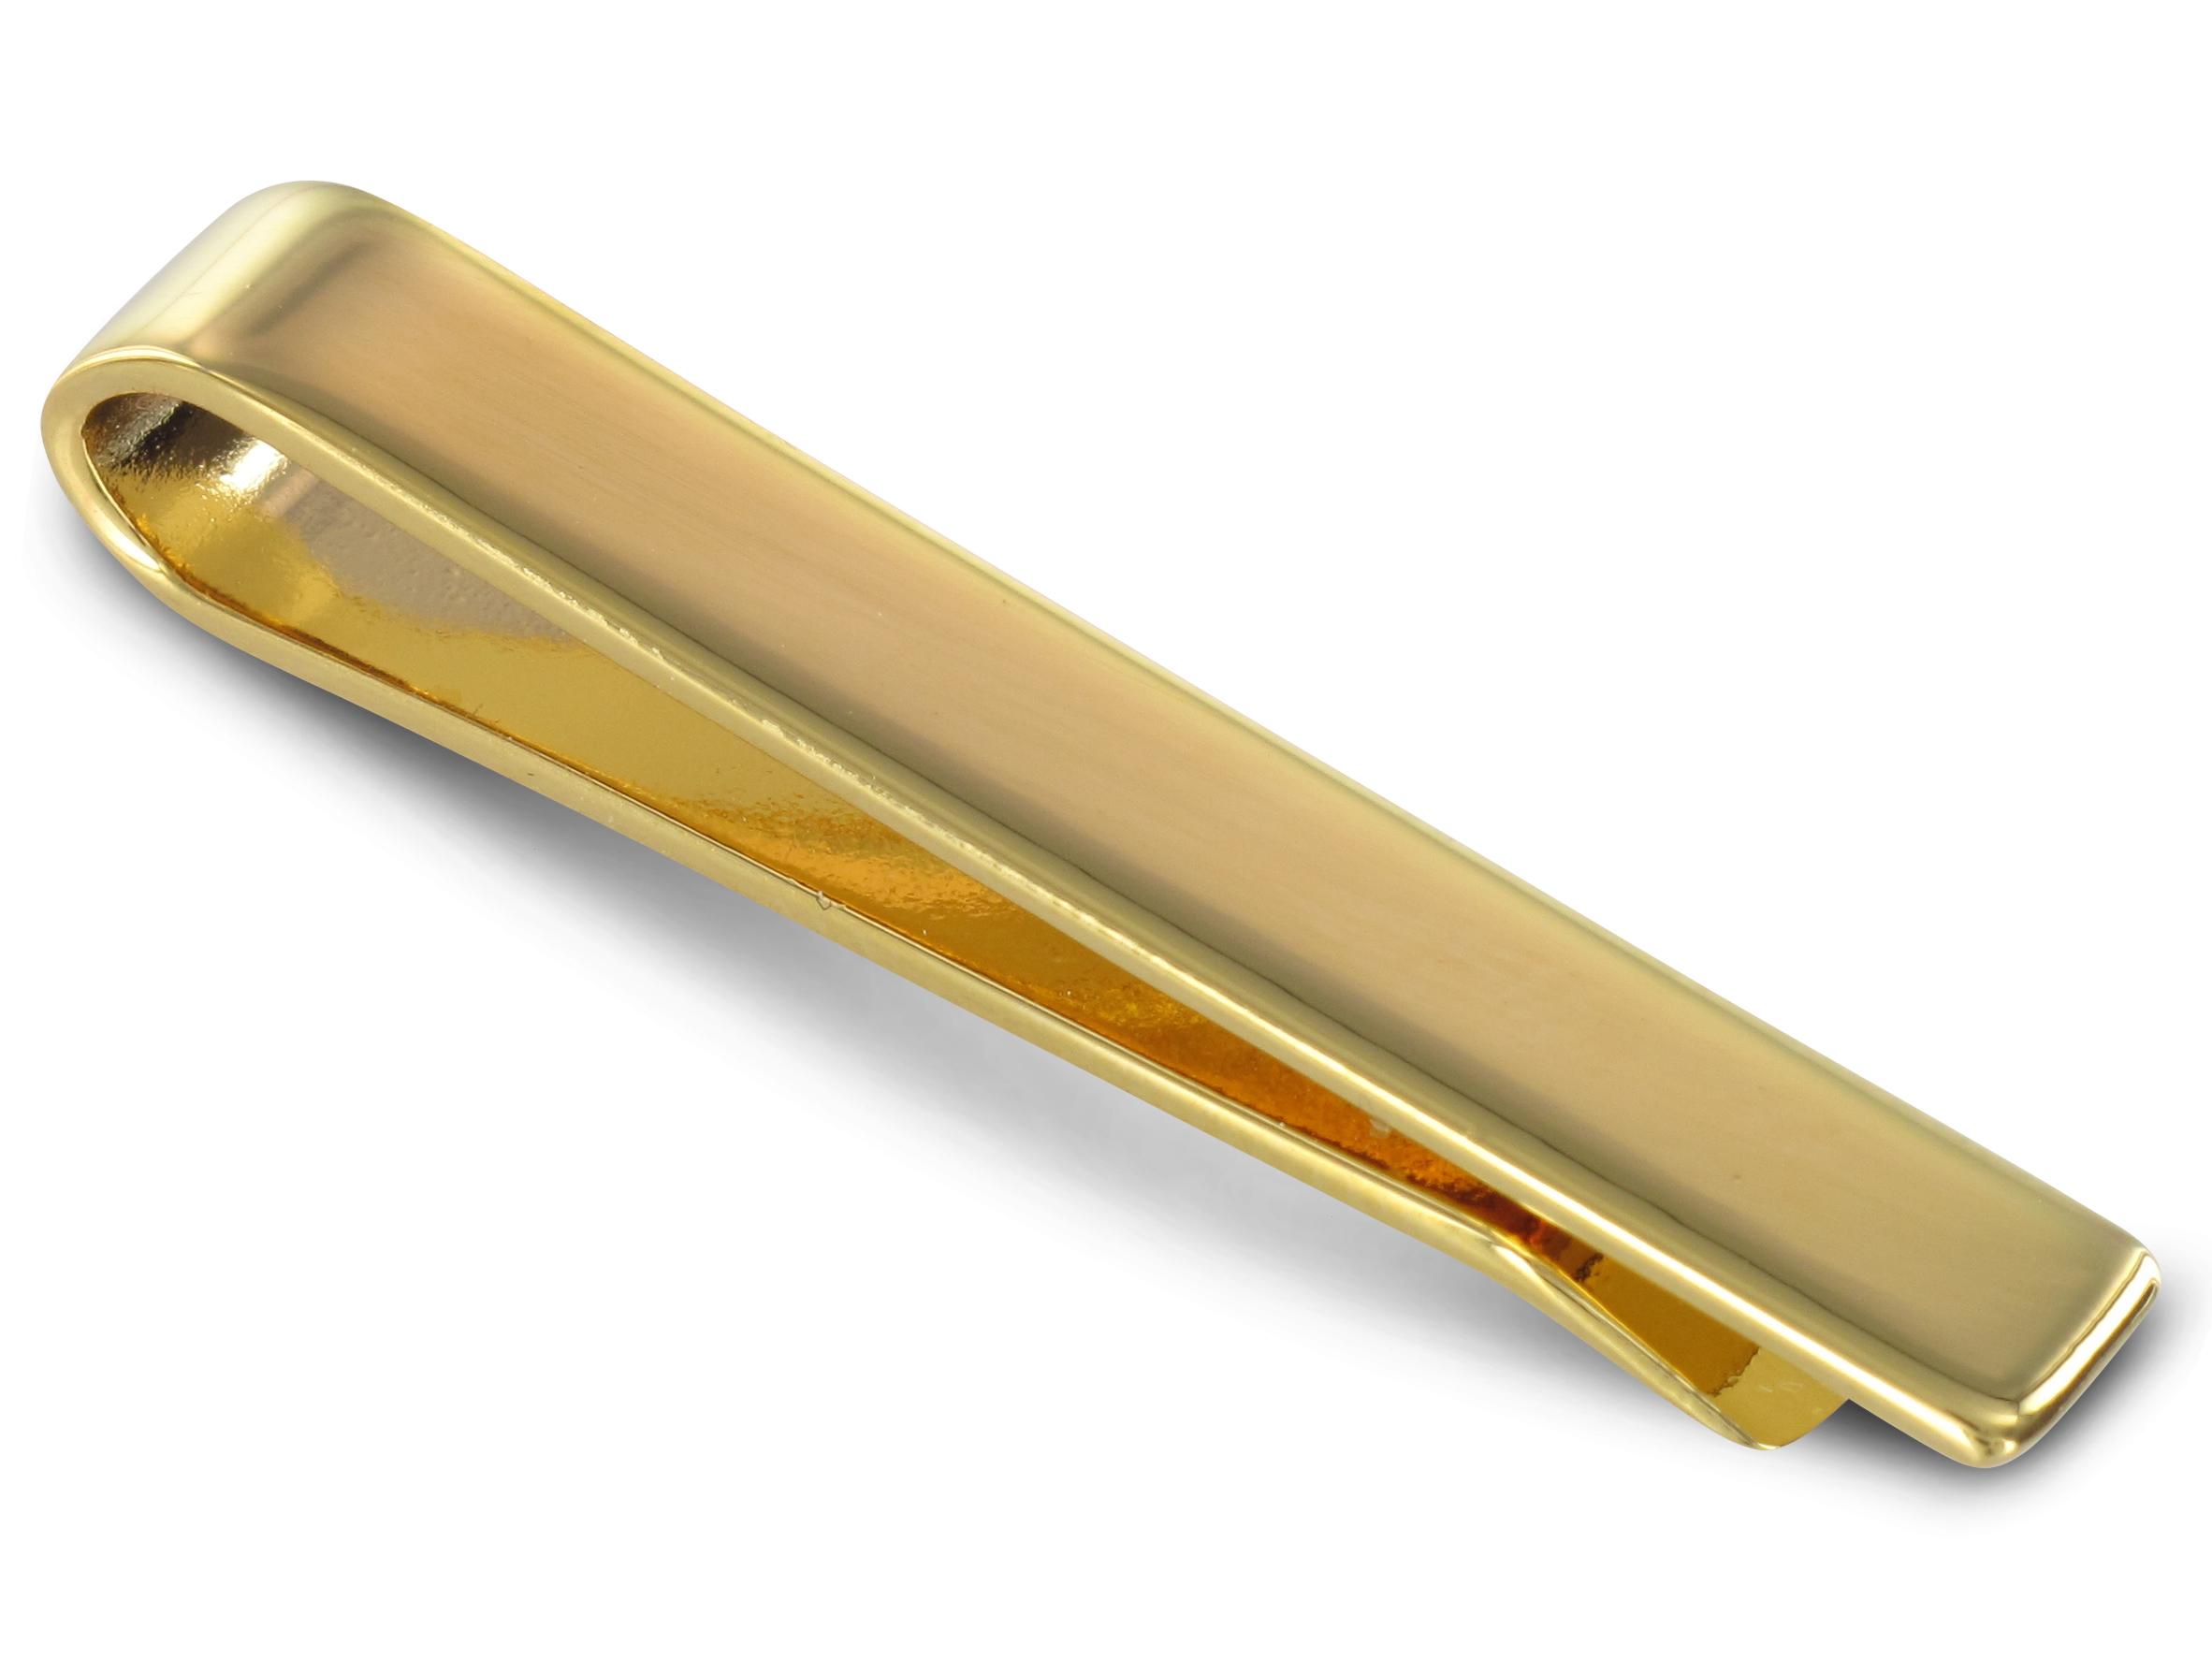 TEROON Krawattenschieber kurz vergoldet Gravur geeignet